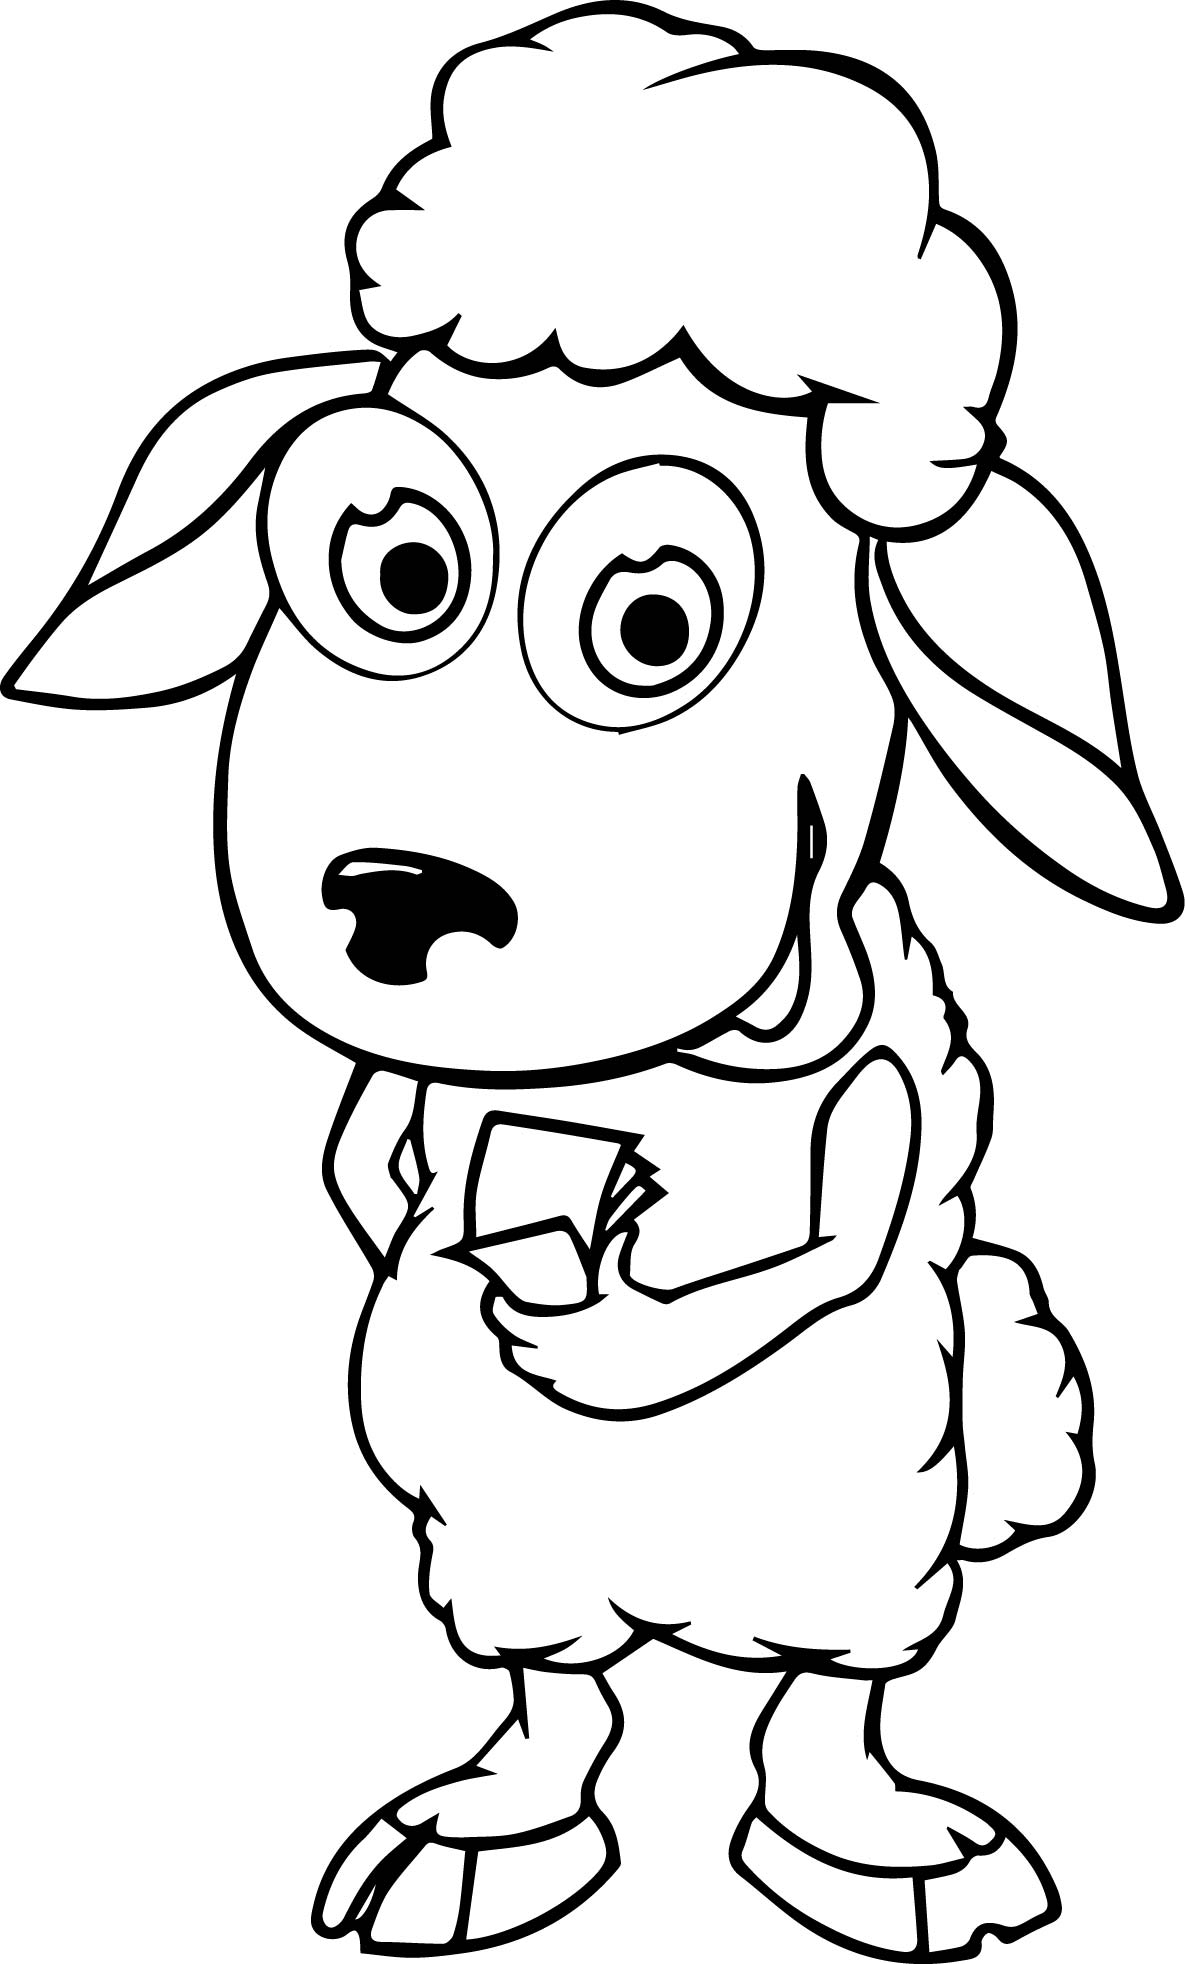 Unique Sheep Coloring Page – COLORINGFUN